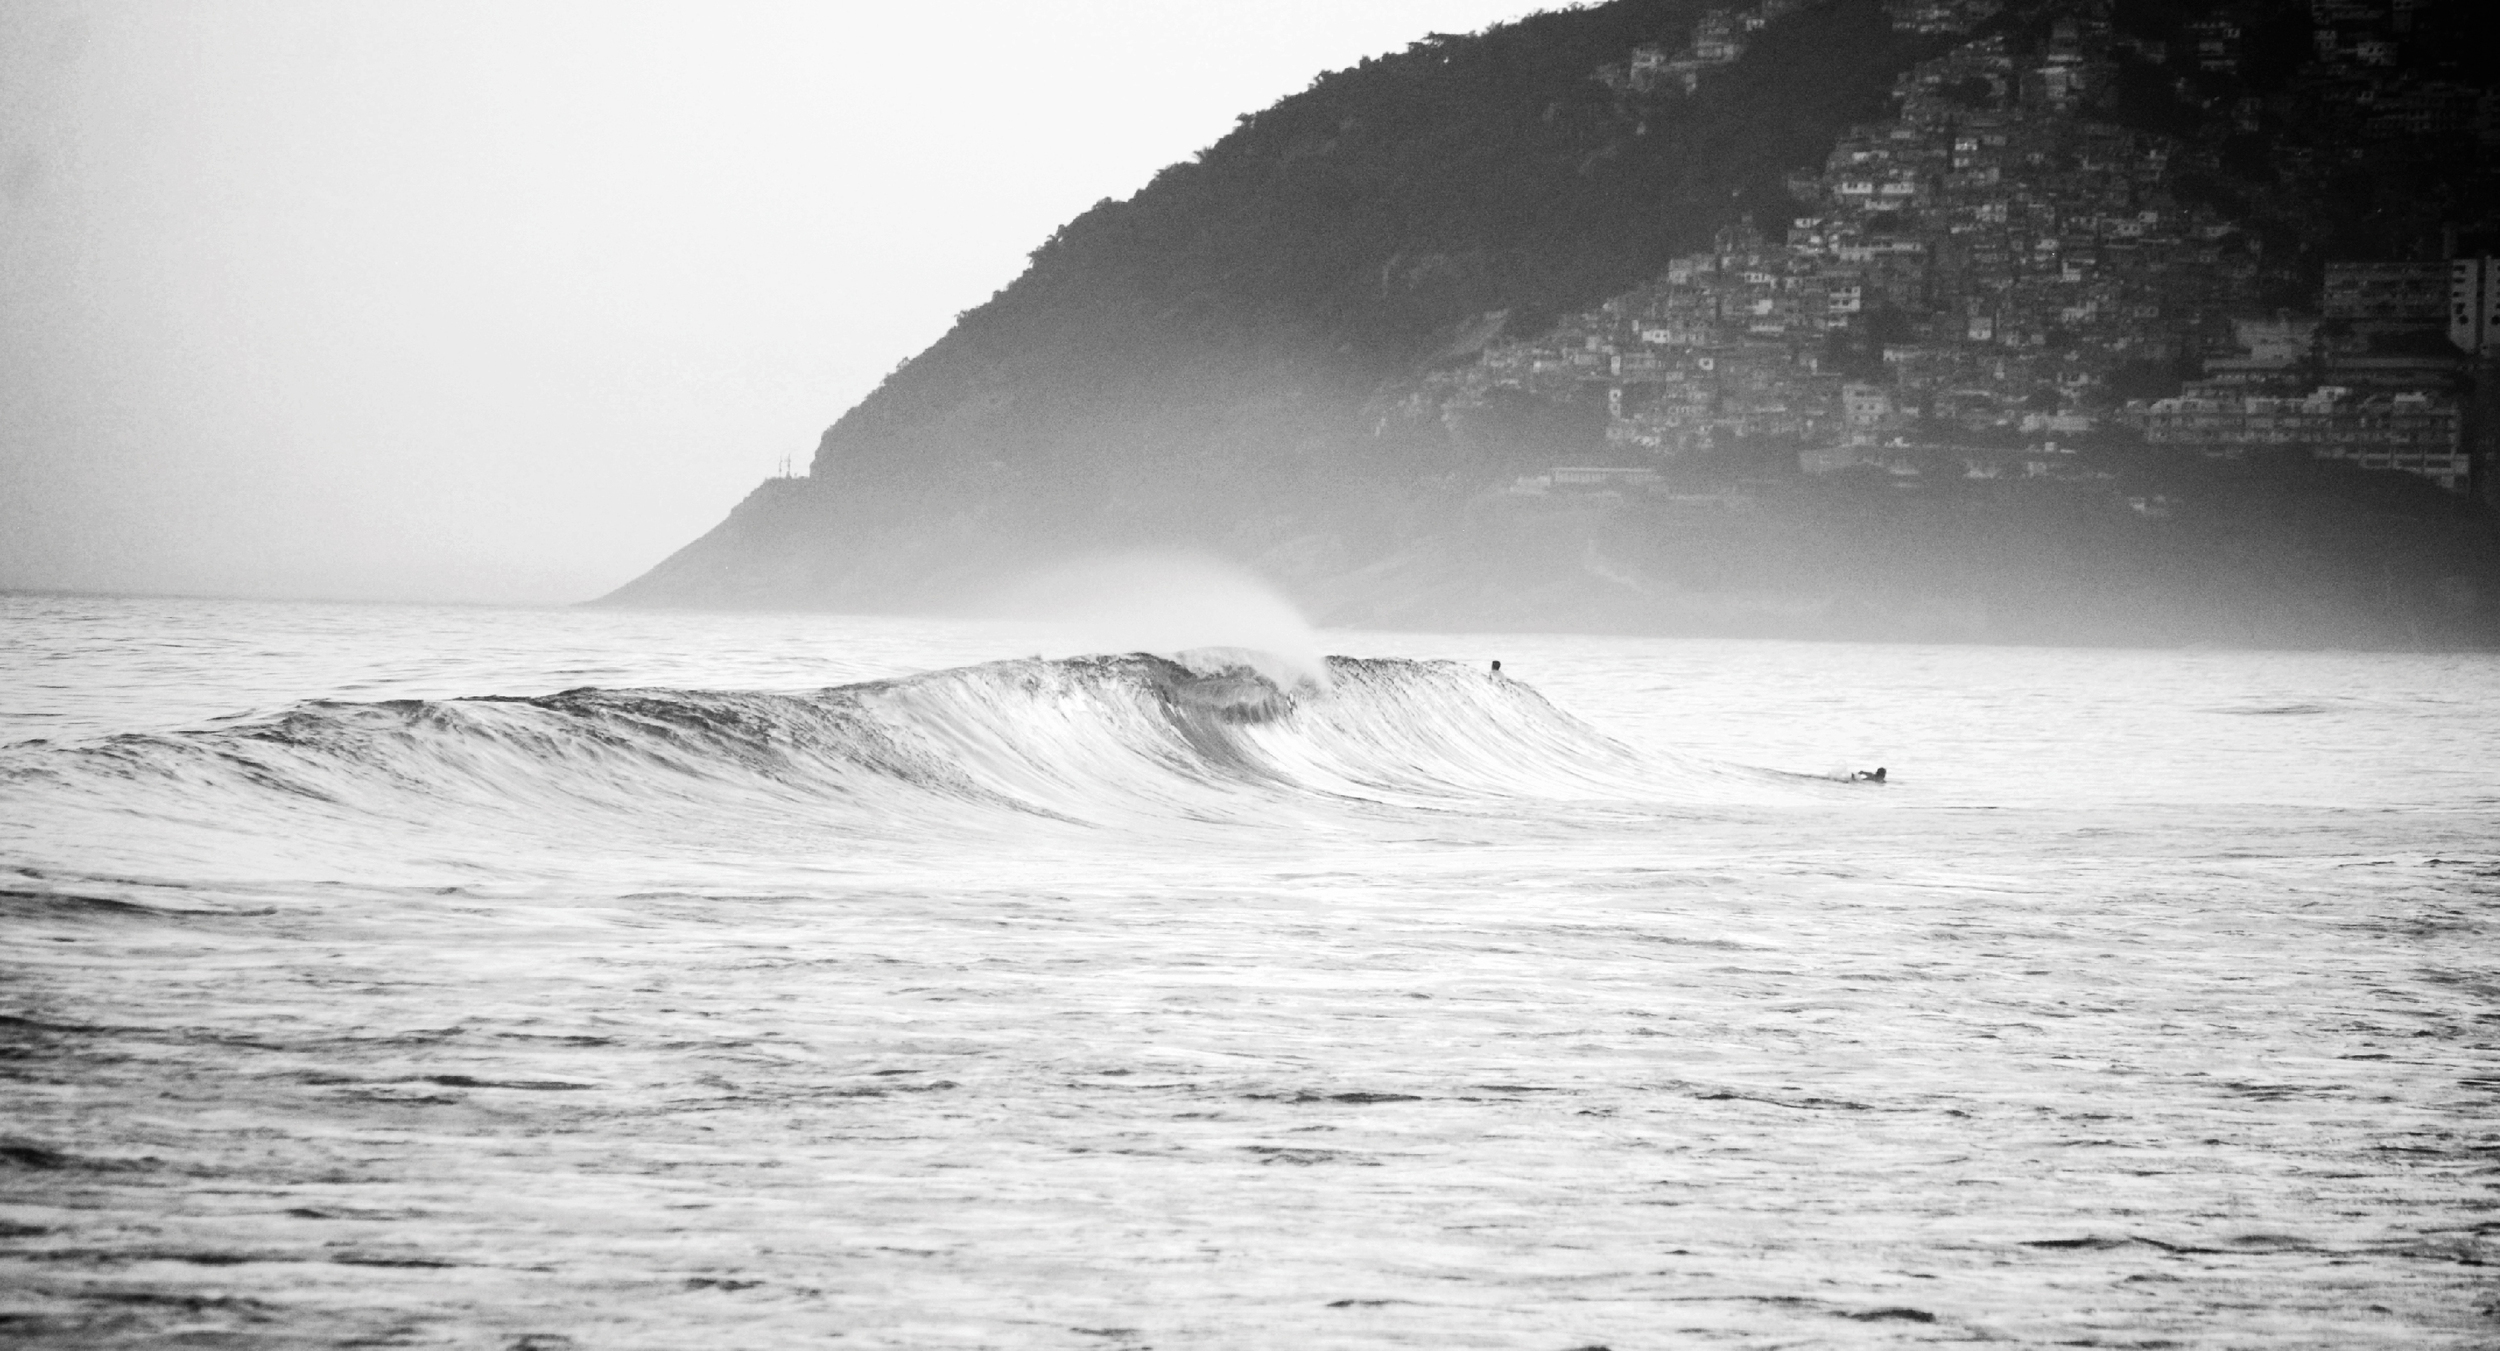 La Mer-wave_crop.jpg